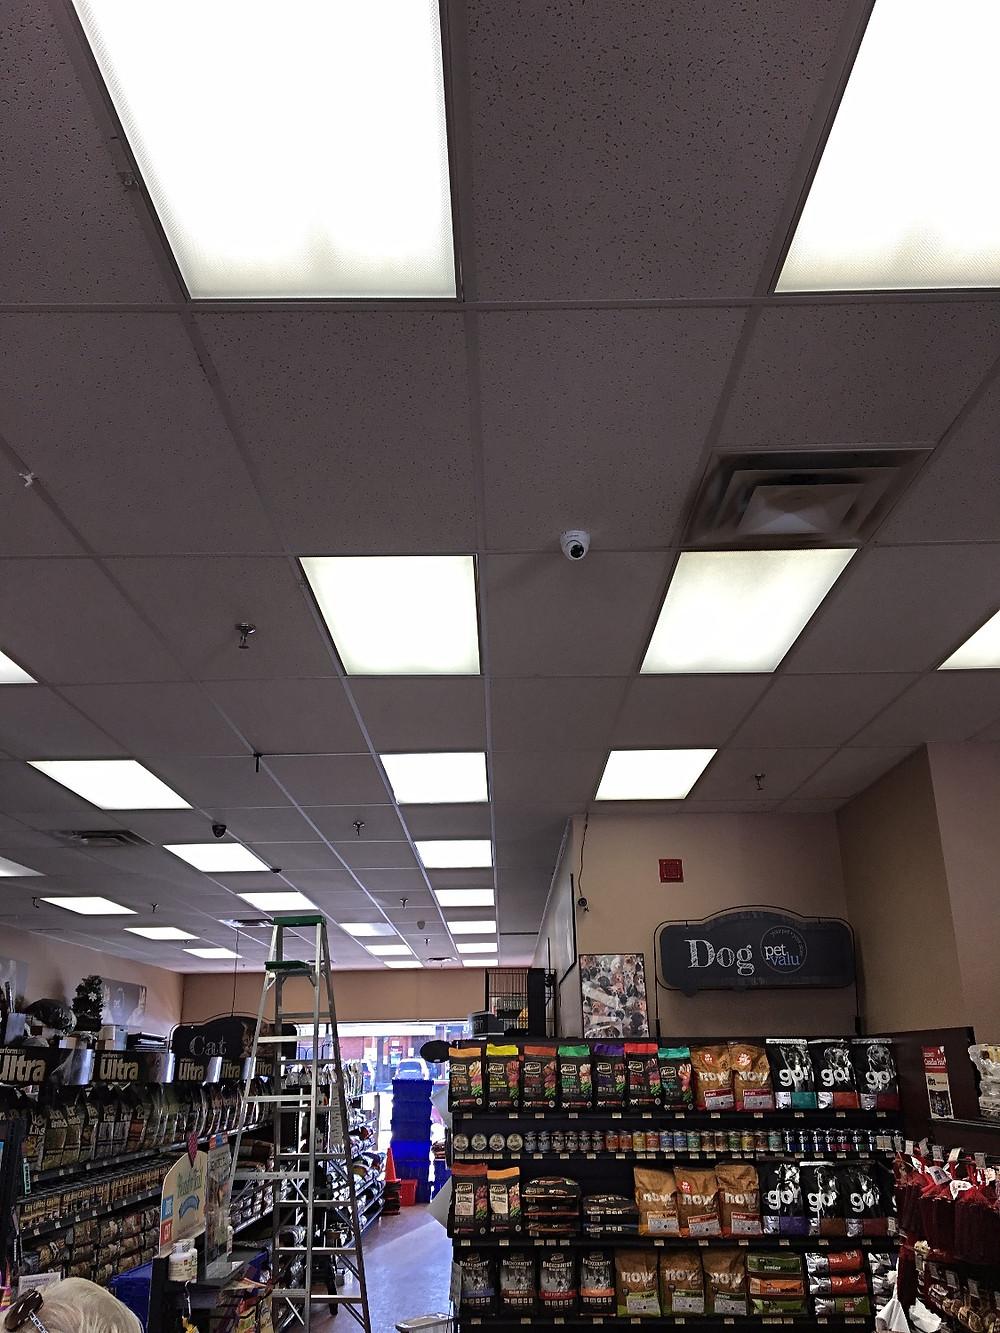 camera viewing store entrance